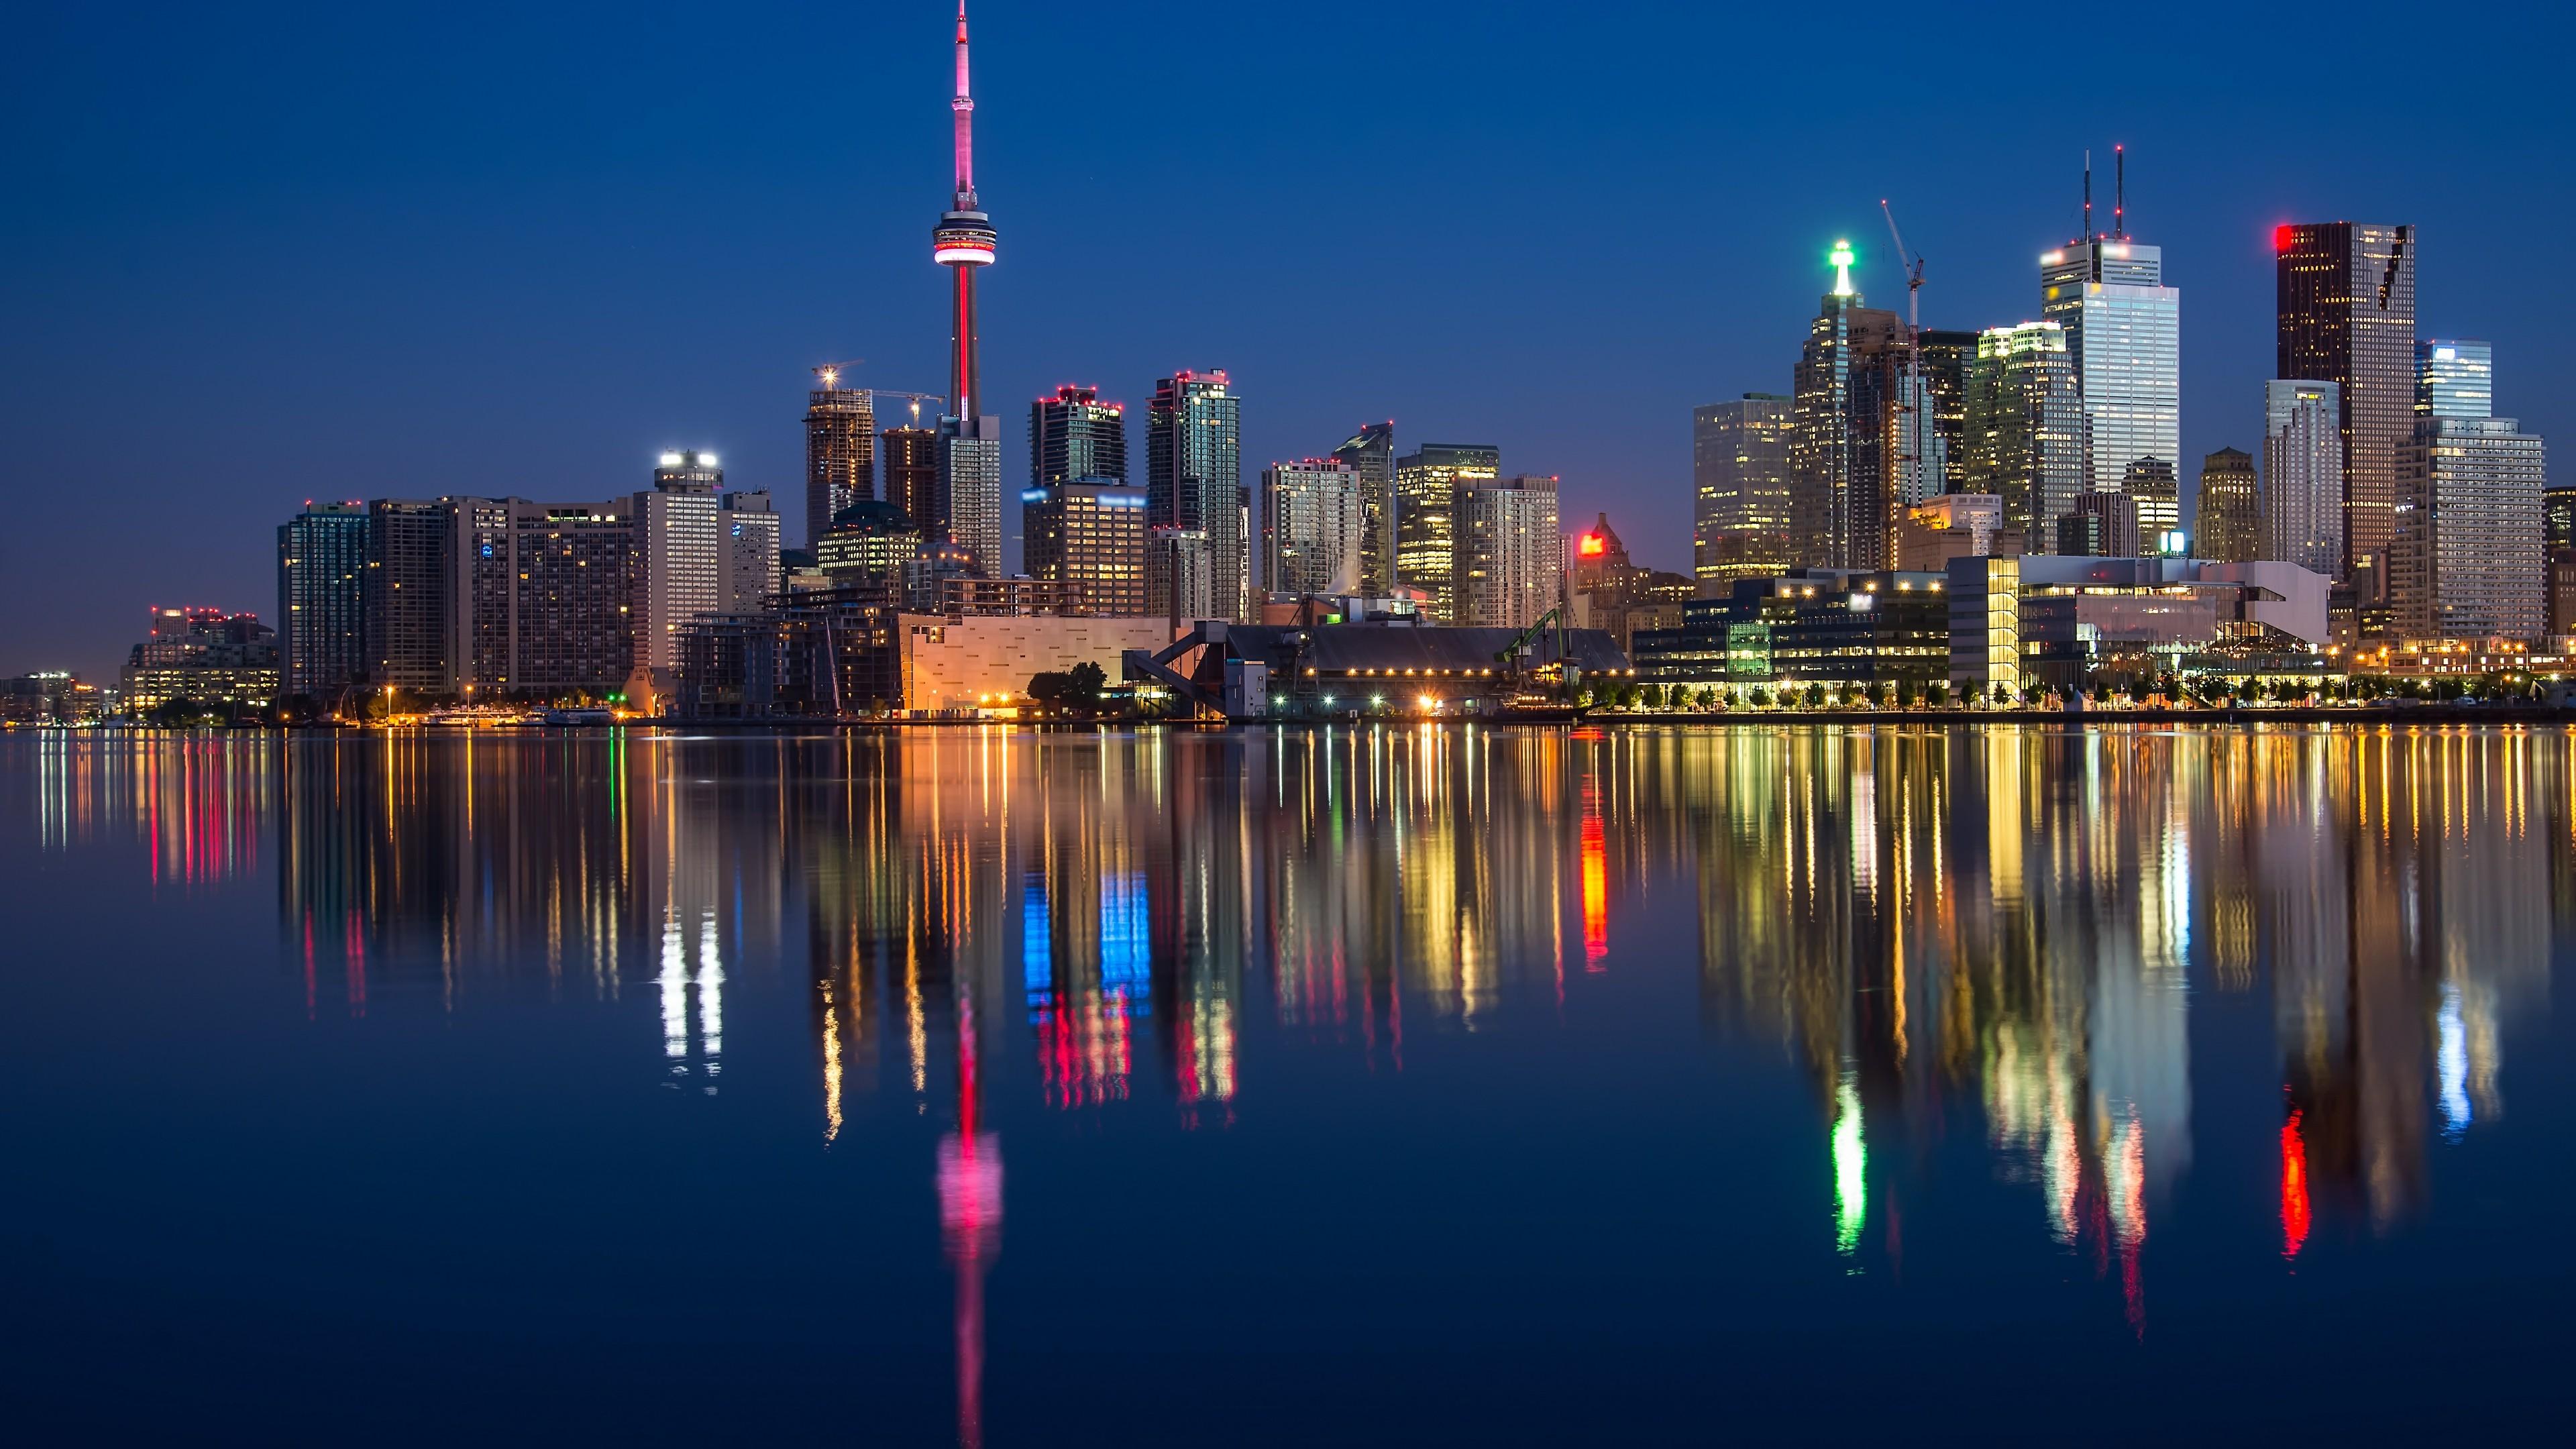 Toronto at night wallpaper